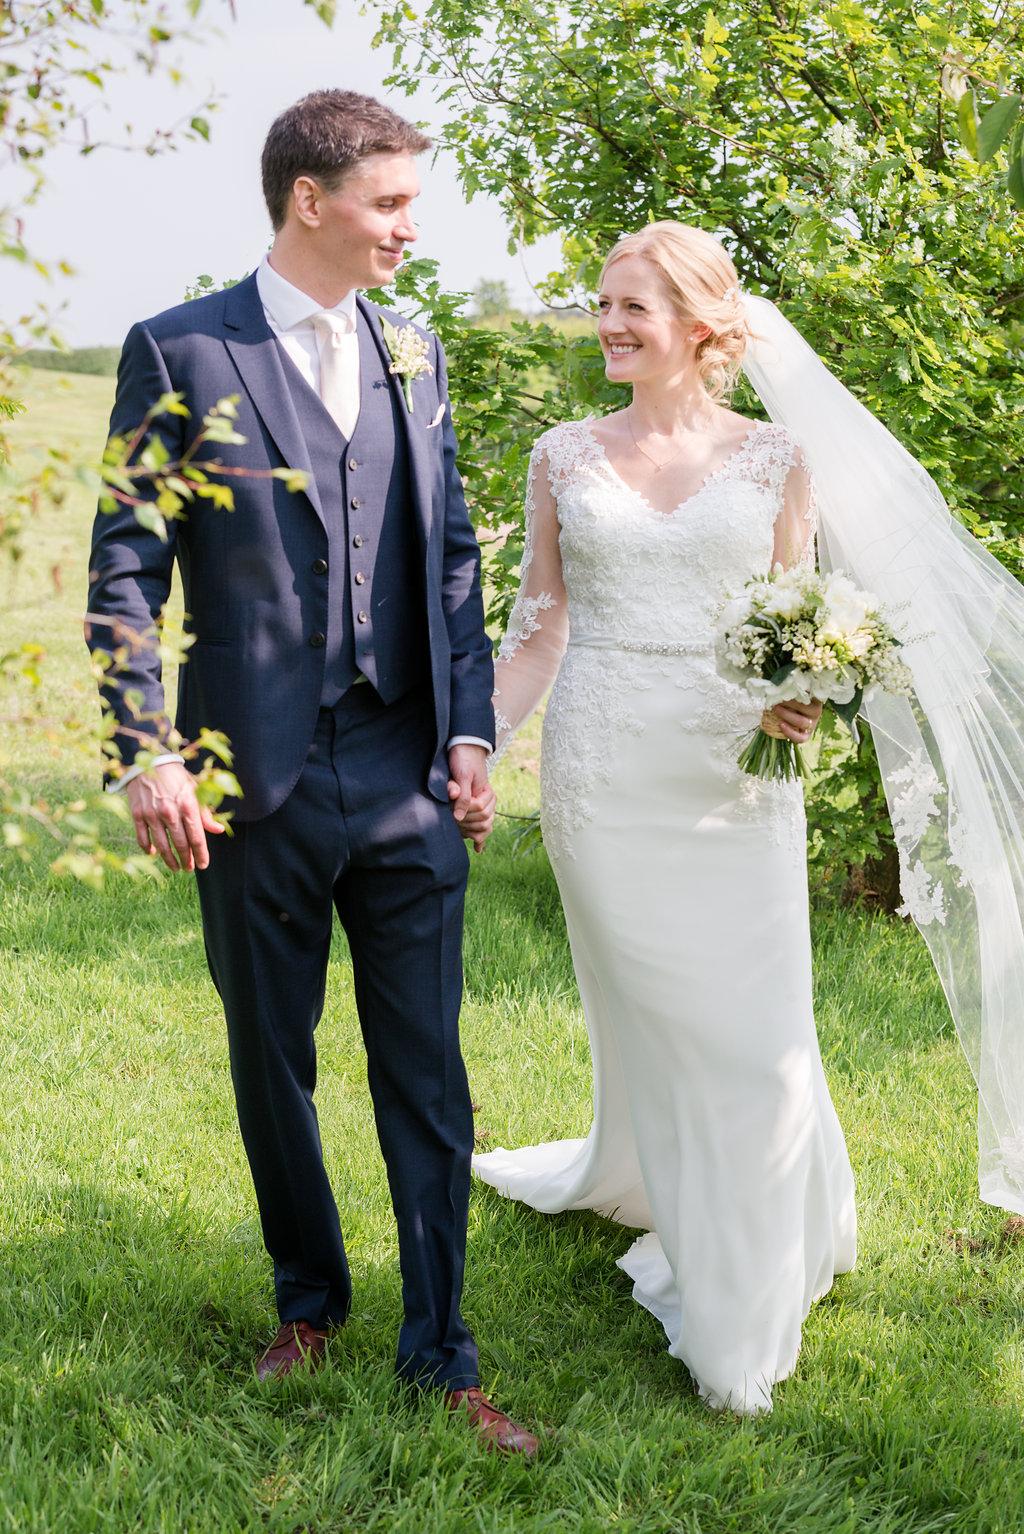 Elegant Greenery & White Rustic Marquee Wedding at Church Farm with ...